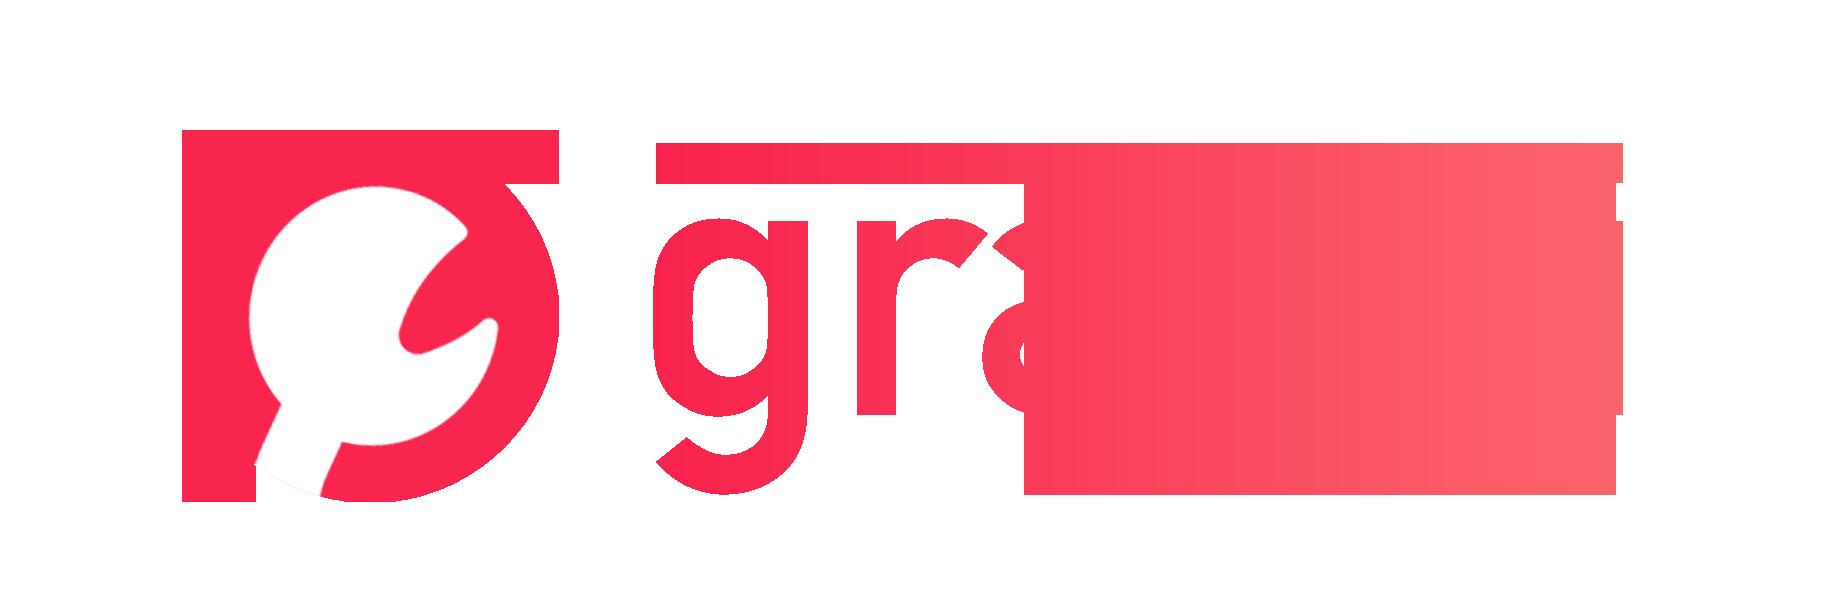 Logo Social Proof